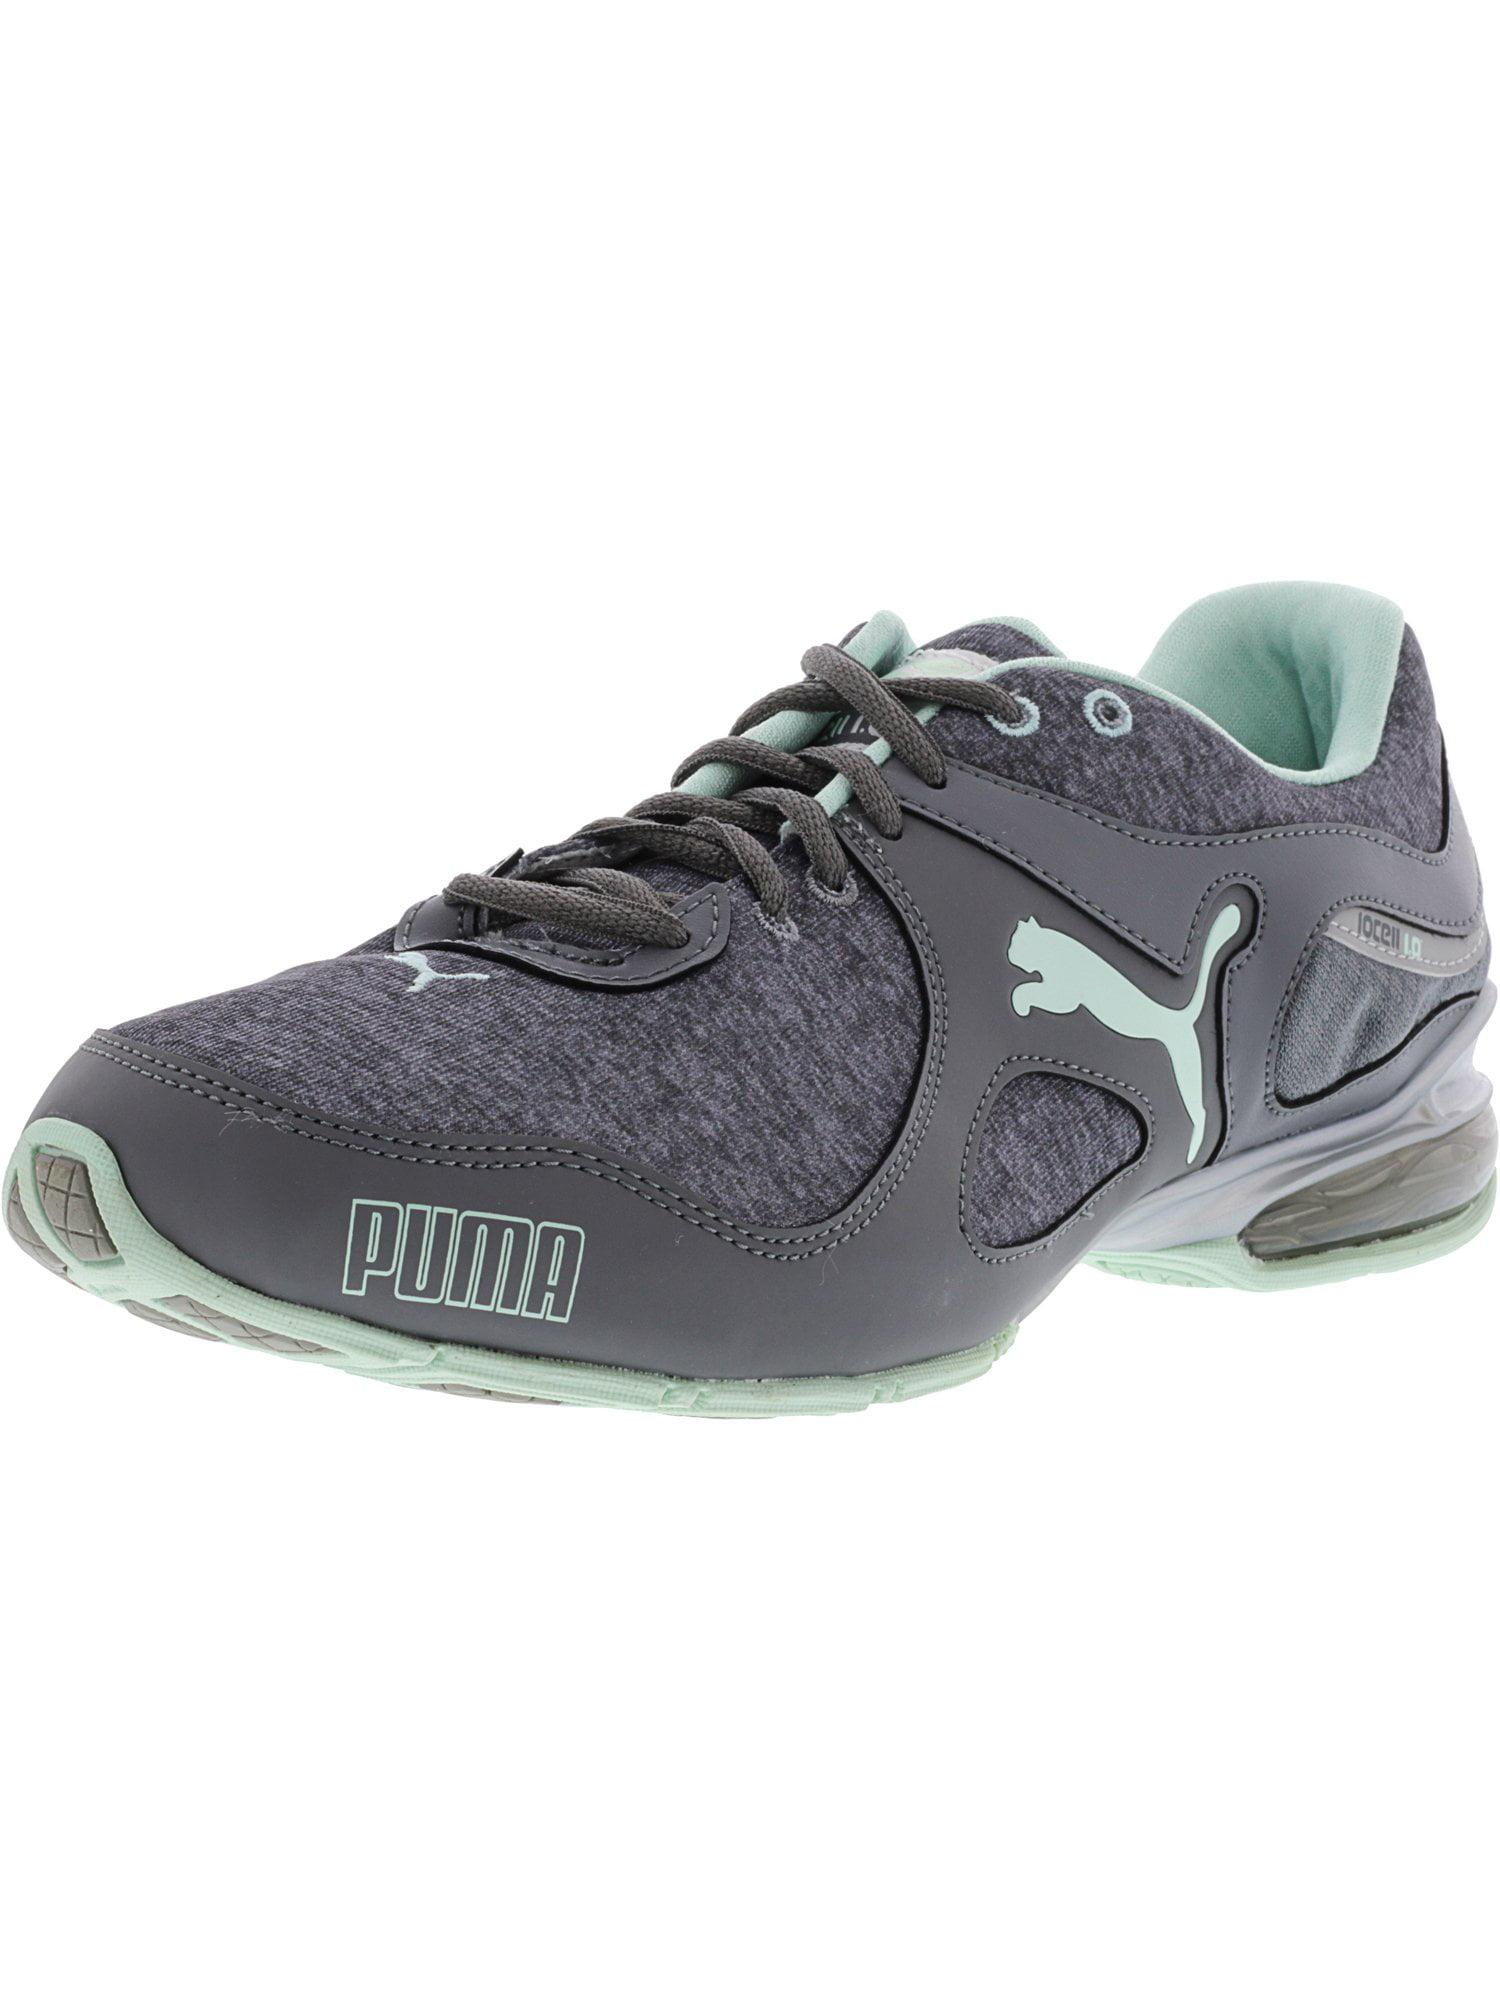 a0bf177081a PUMA - Puma Women s Cell Riaze Heather Fm Steel Gray   Drizzle Bay  Ankle-High Cross Trainer Shoe - 10.5M - Walmart.com